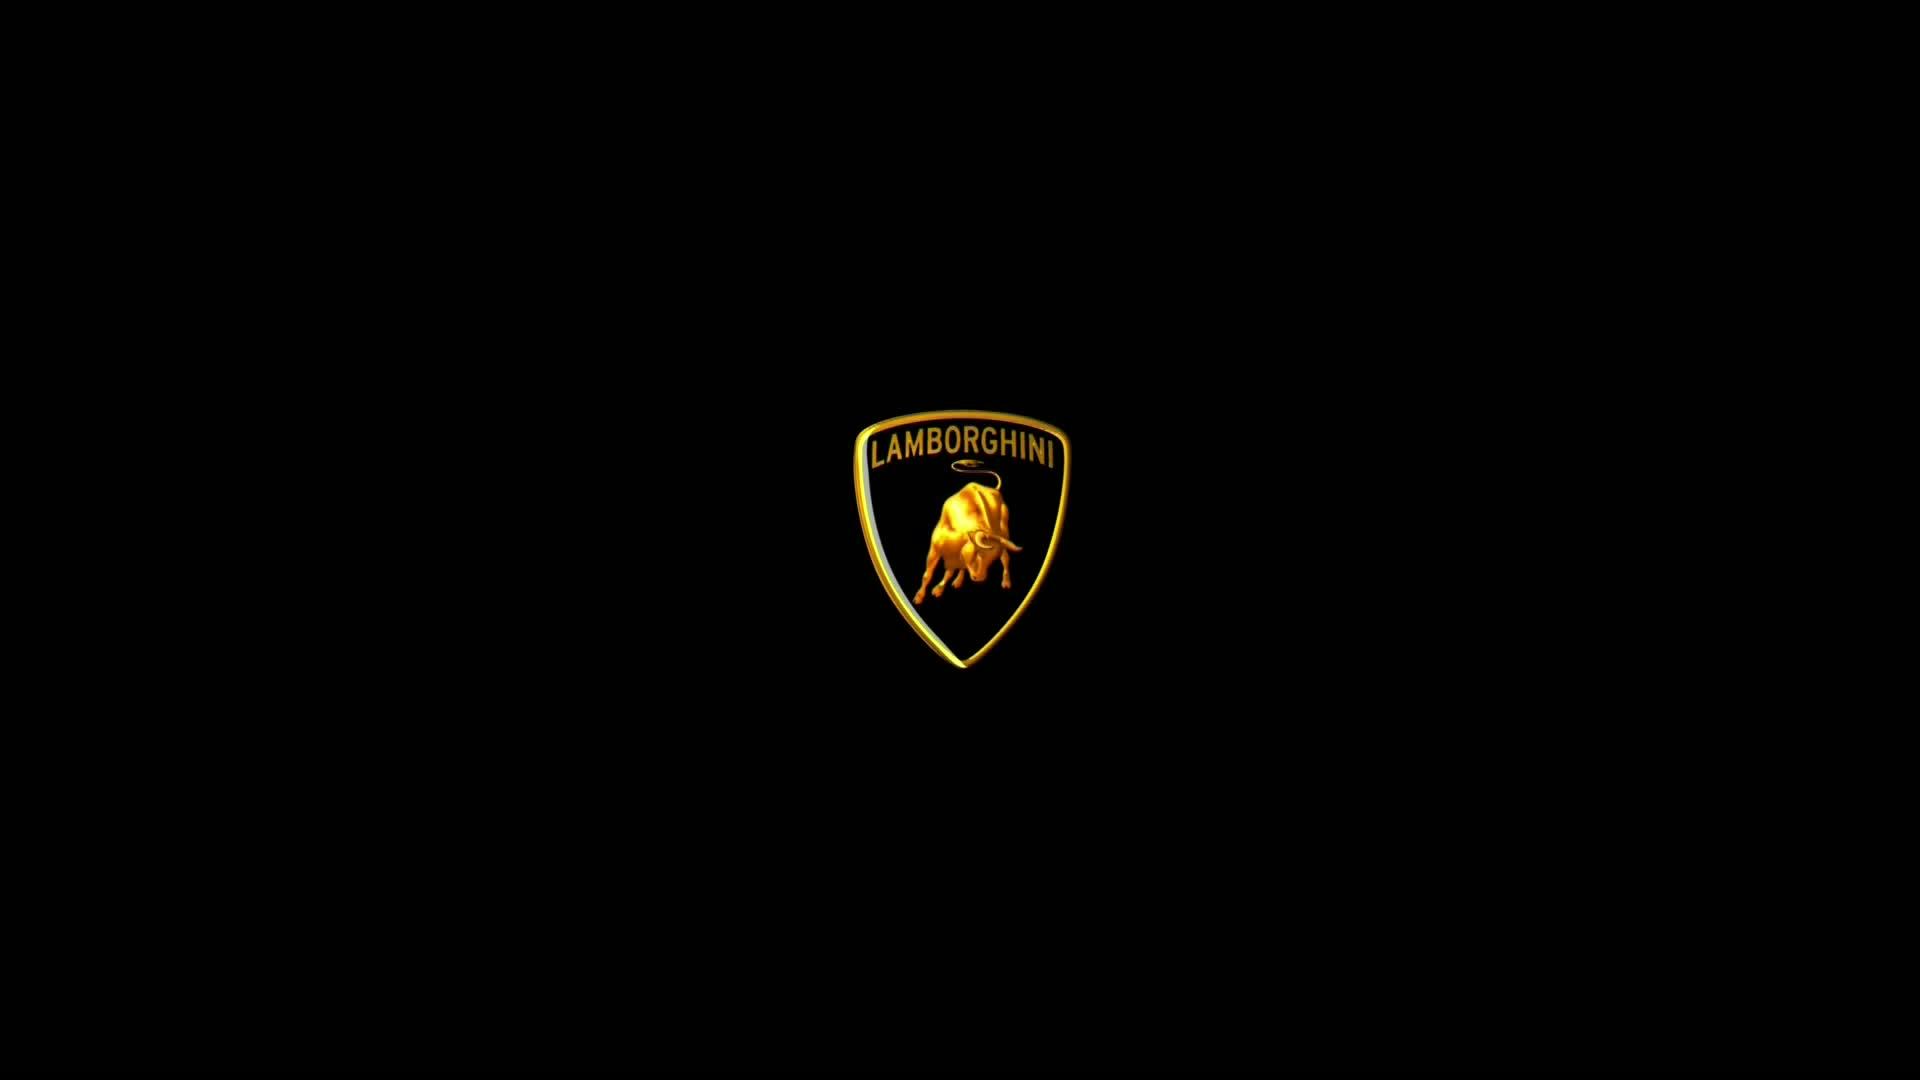 lamborghini symbol hd images animaxwallpaper com